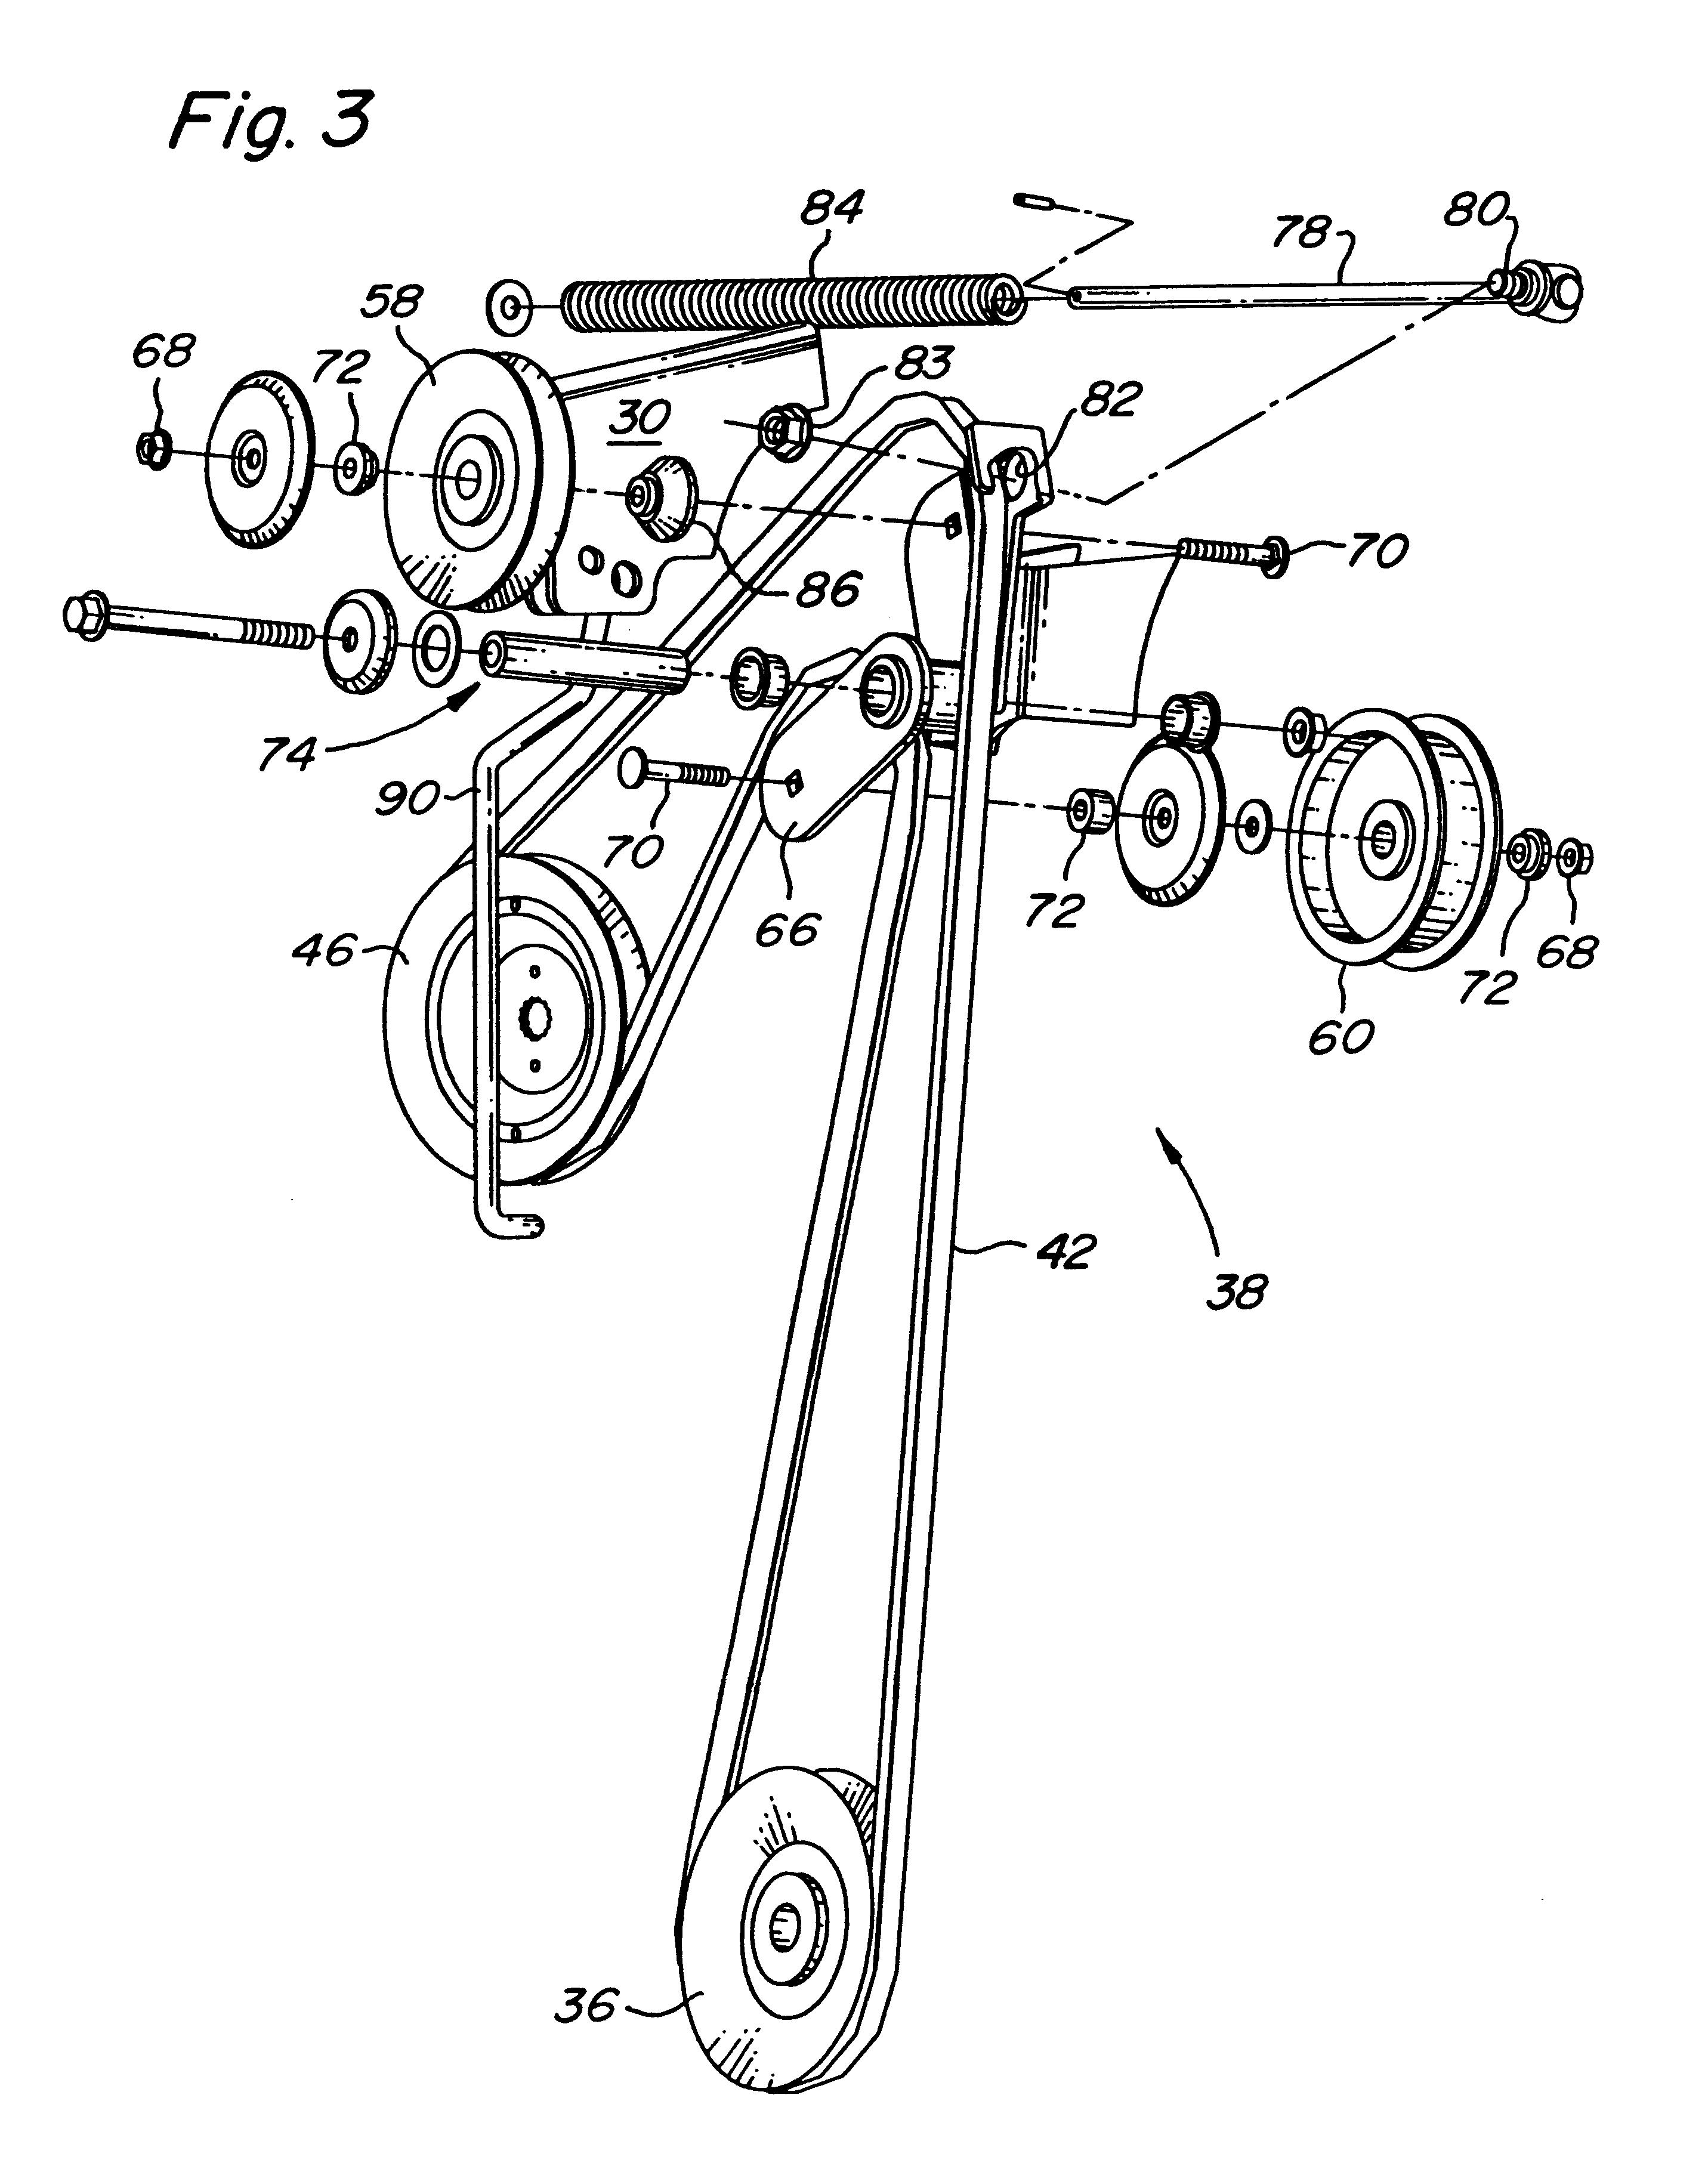 john deere x300r wiring diagram great installation of wiring diagram Volvo PTO wiring diagram for x300r diagram for generators wiring john deere 175 hydro john deere x300 wiring schematic